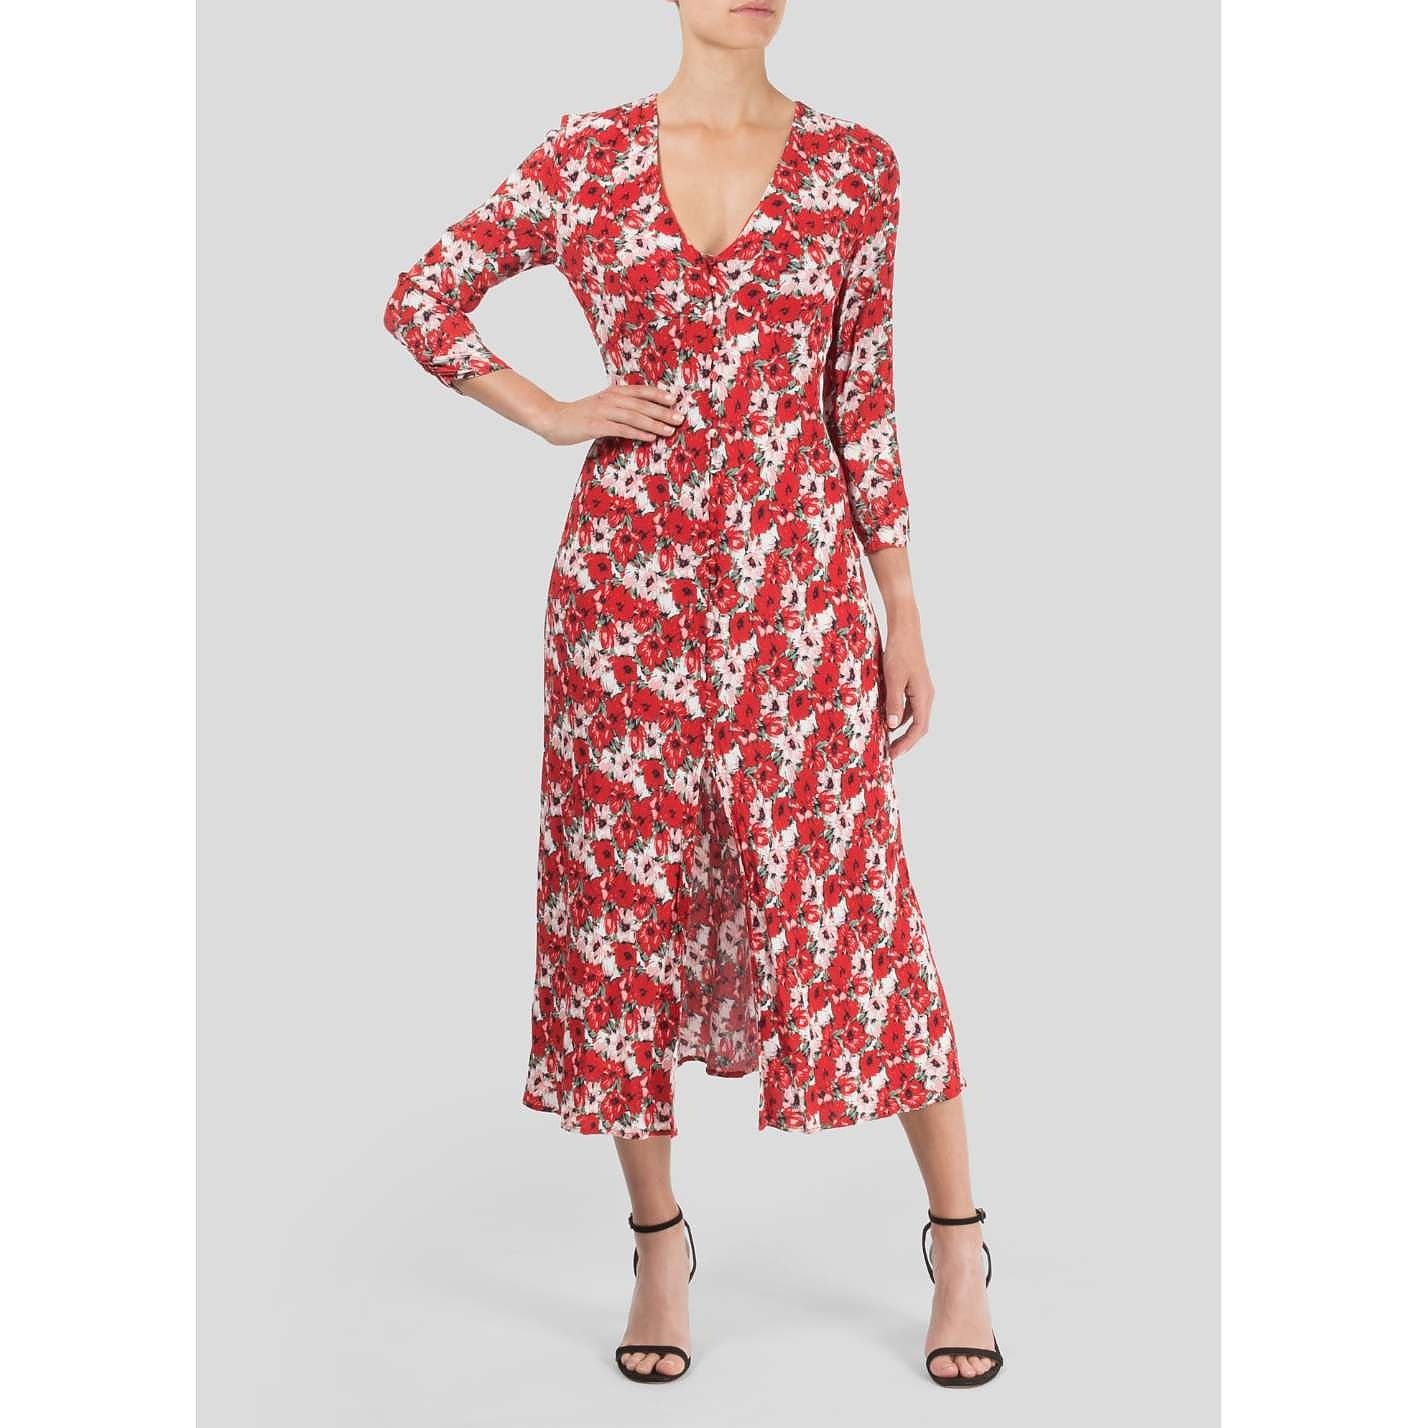 Rixo Katie Floral Dress